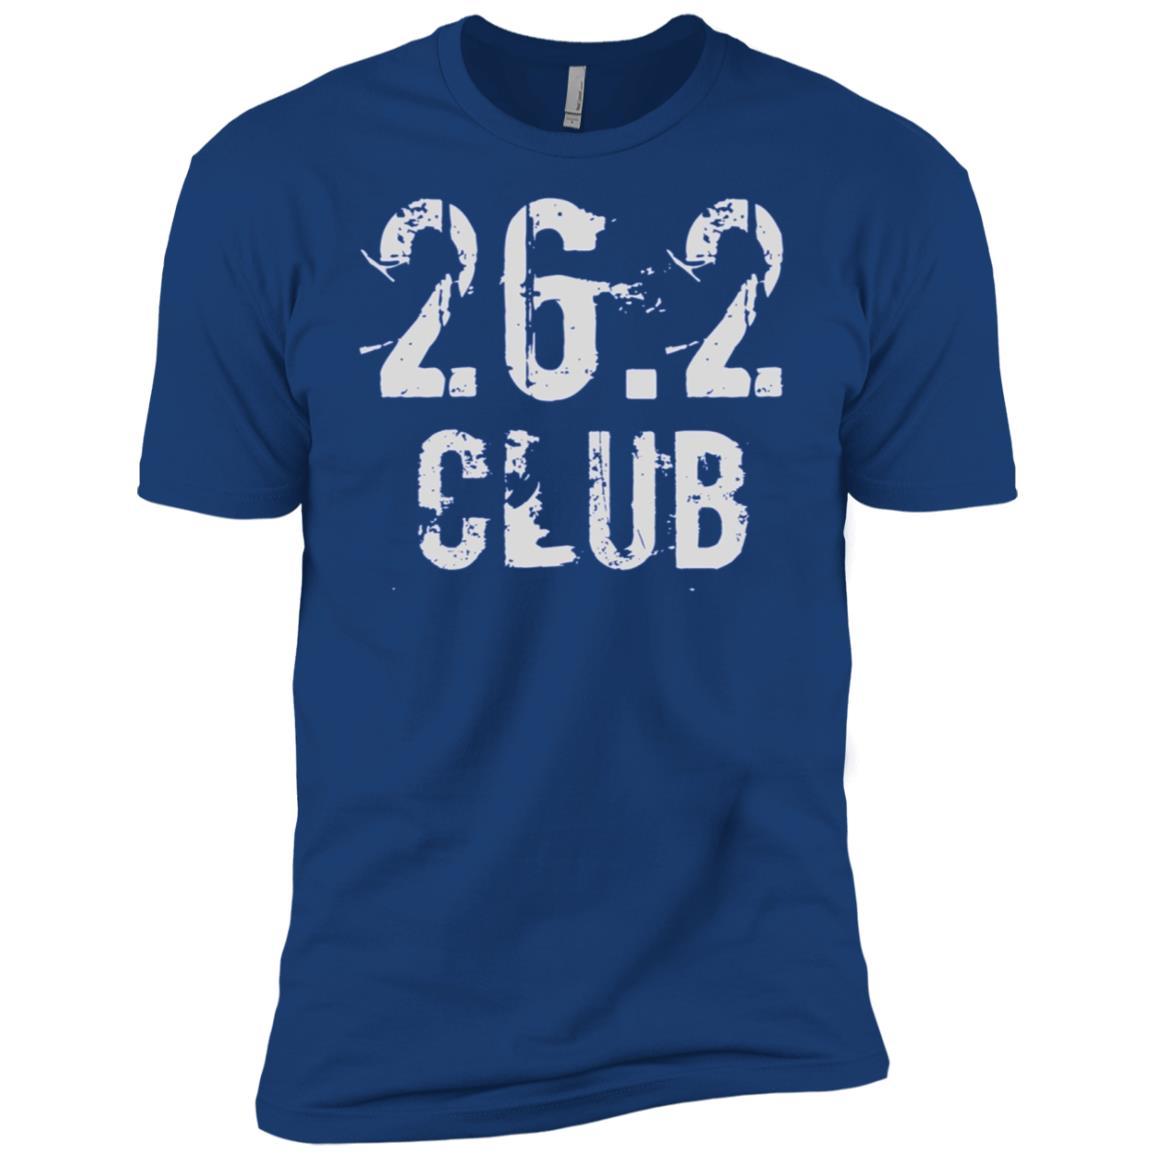 26 Marathon Running Marathon Runners Gifts Men Short Sleeve T-Shirt